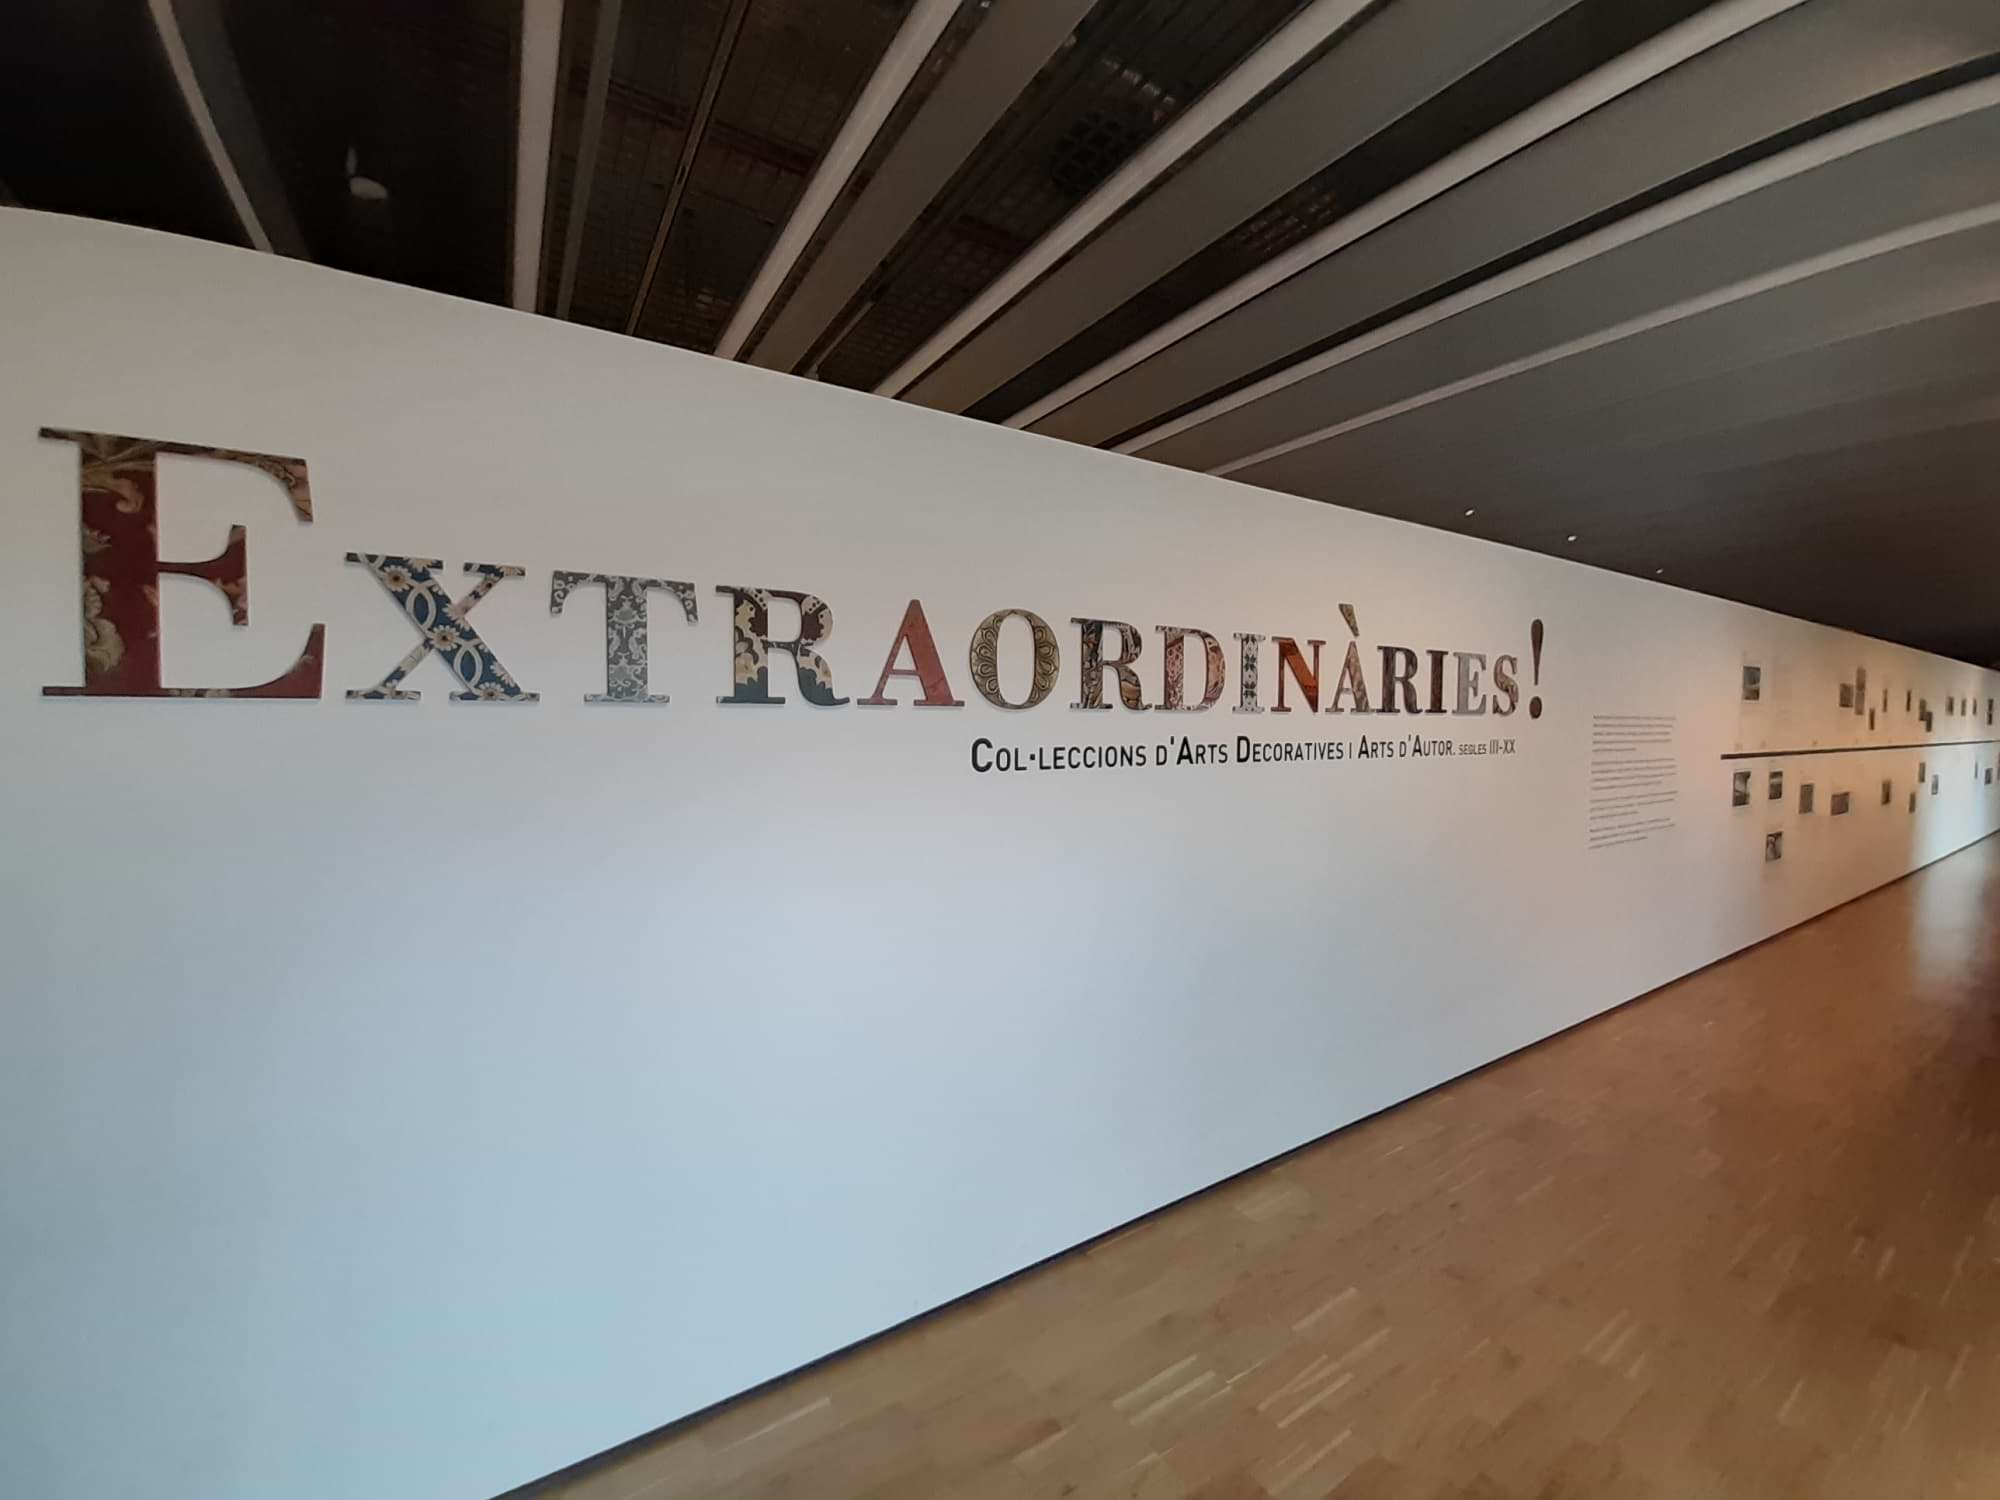 Extraordinaries Collections Arts décoratifs